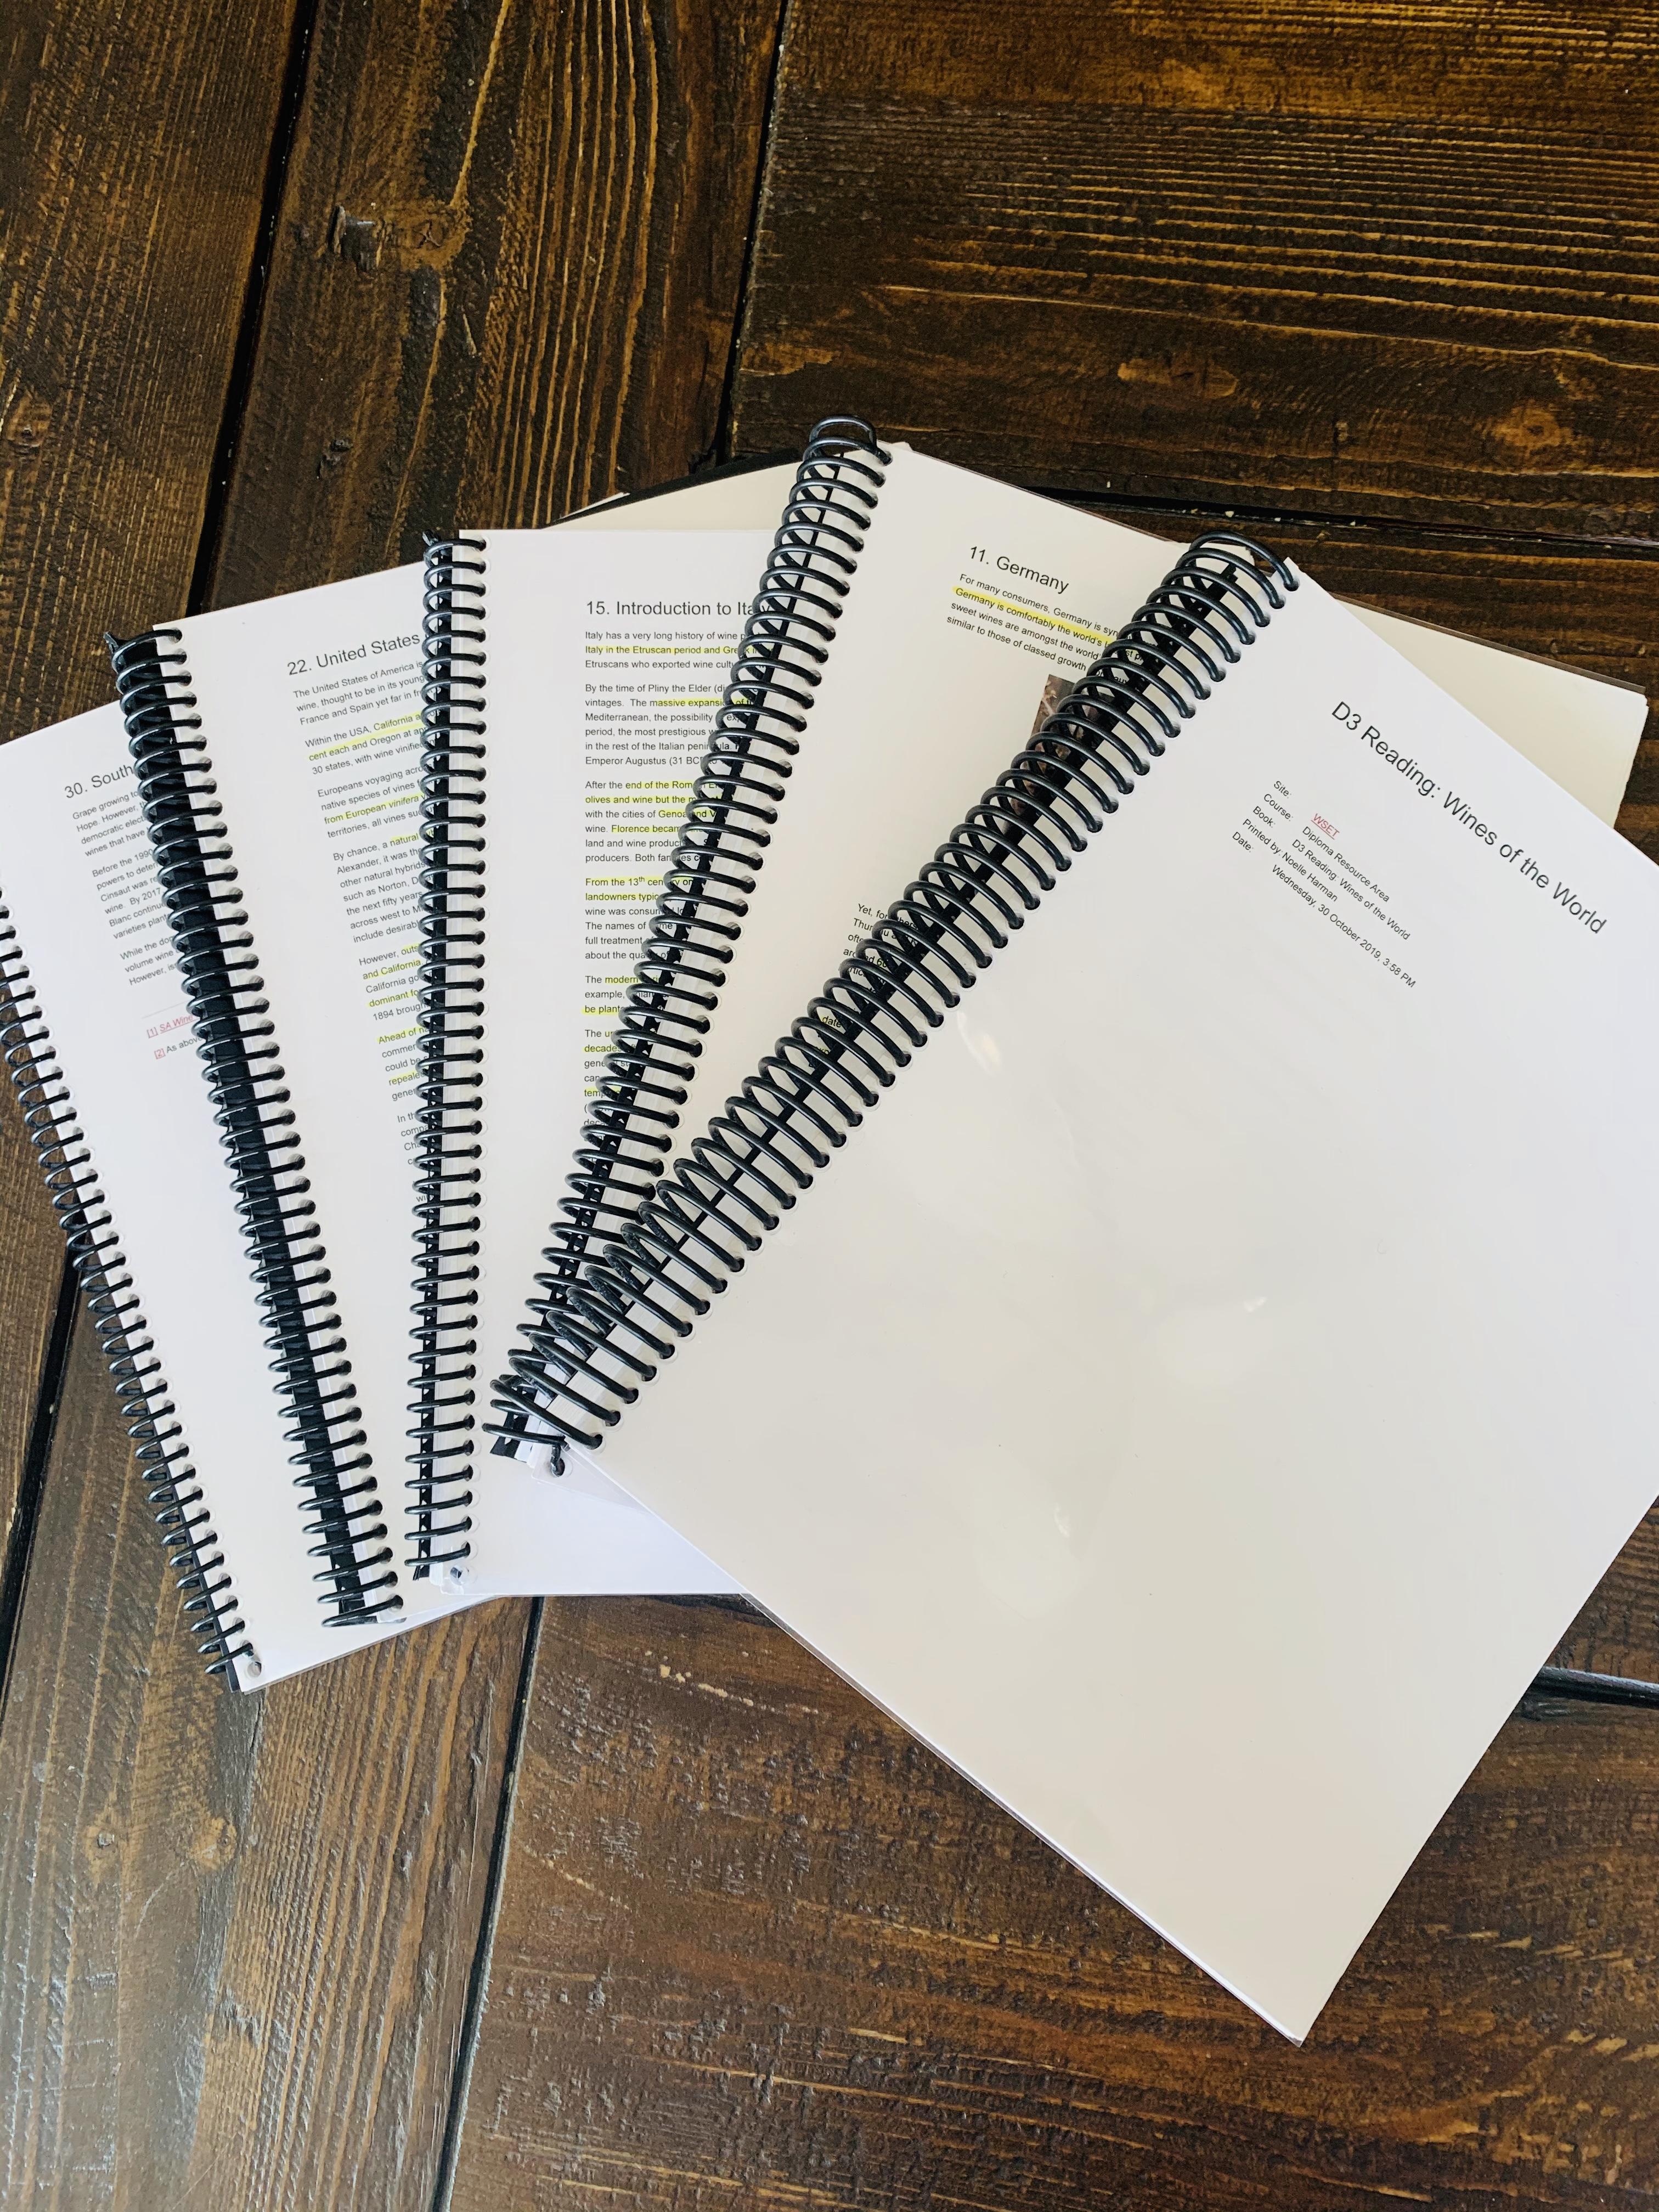 WSET Diploma D3 Textbooks